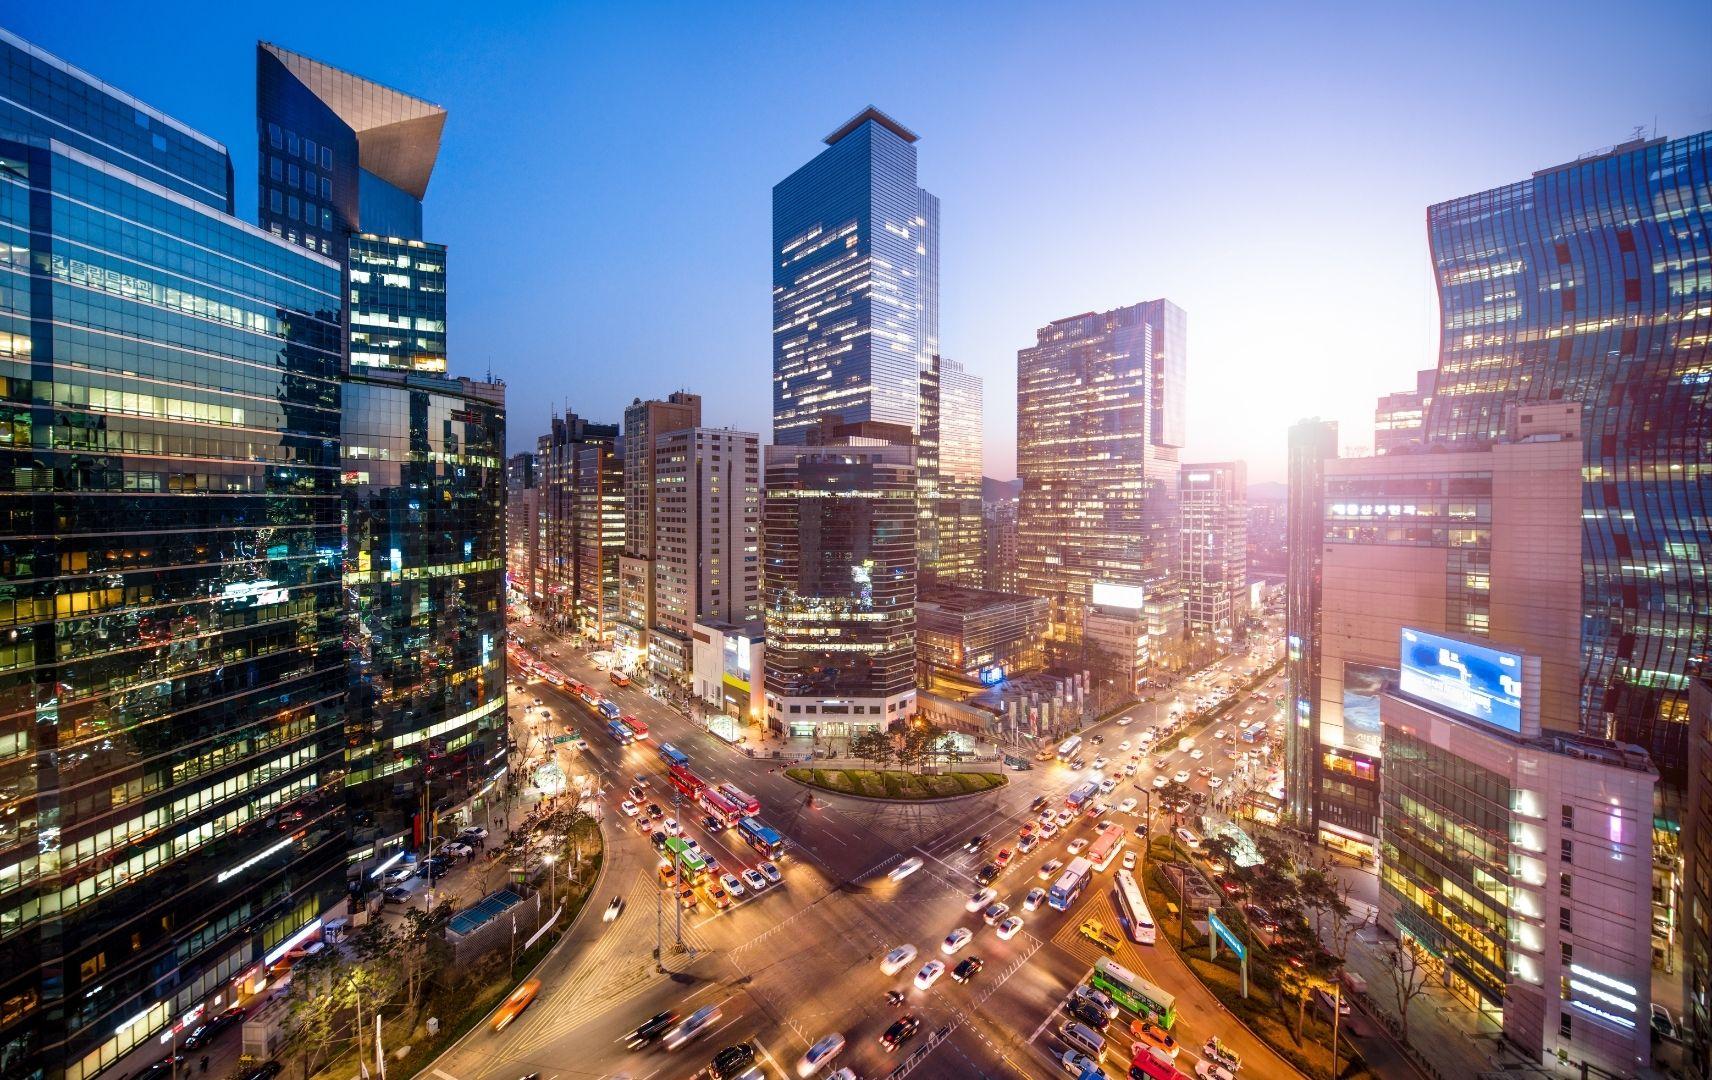 Gangnam business district, Seoul